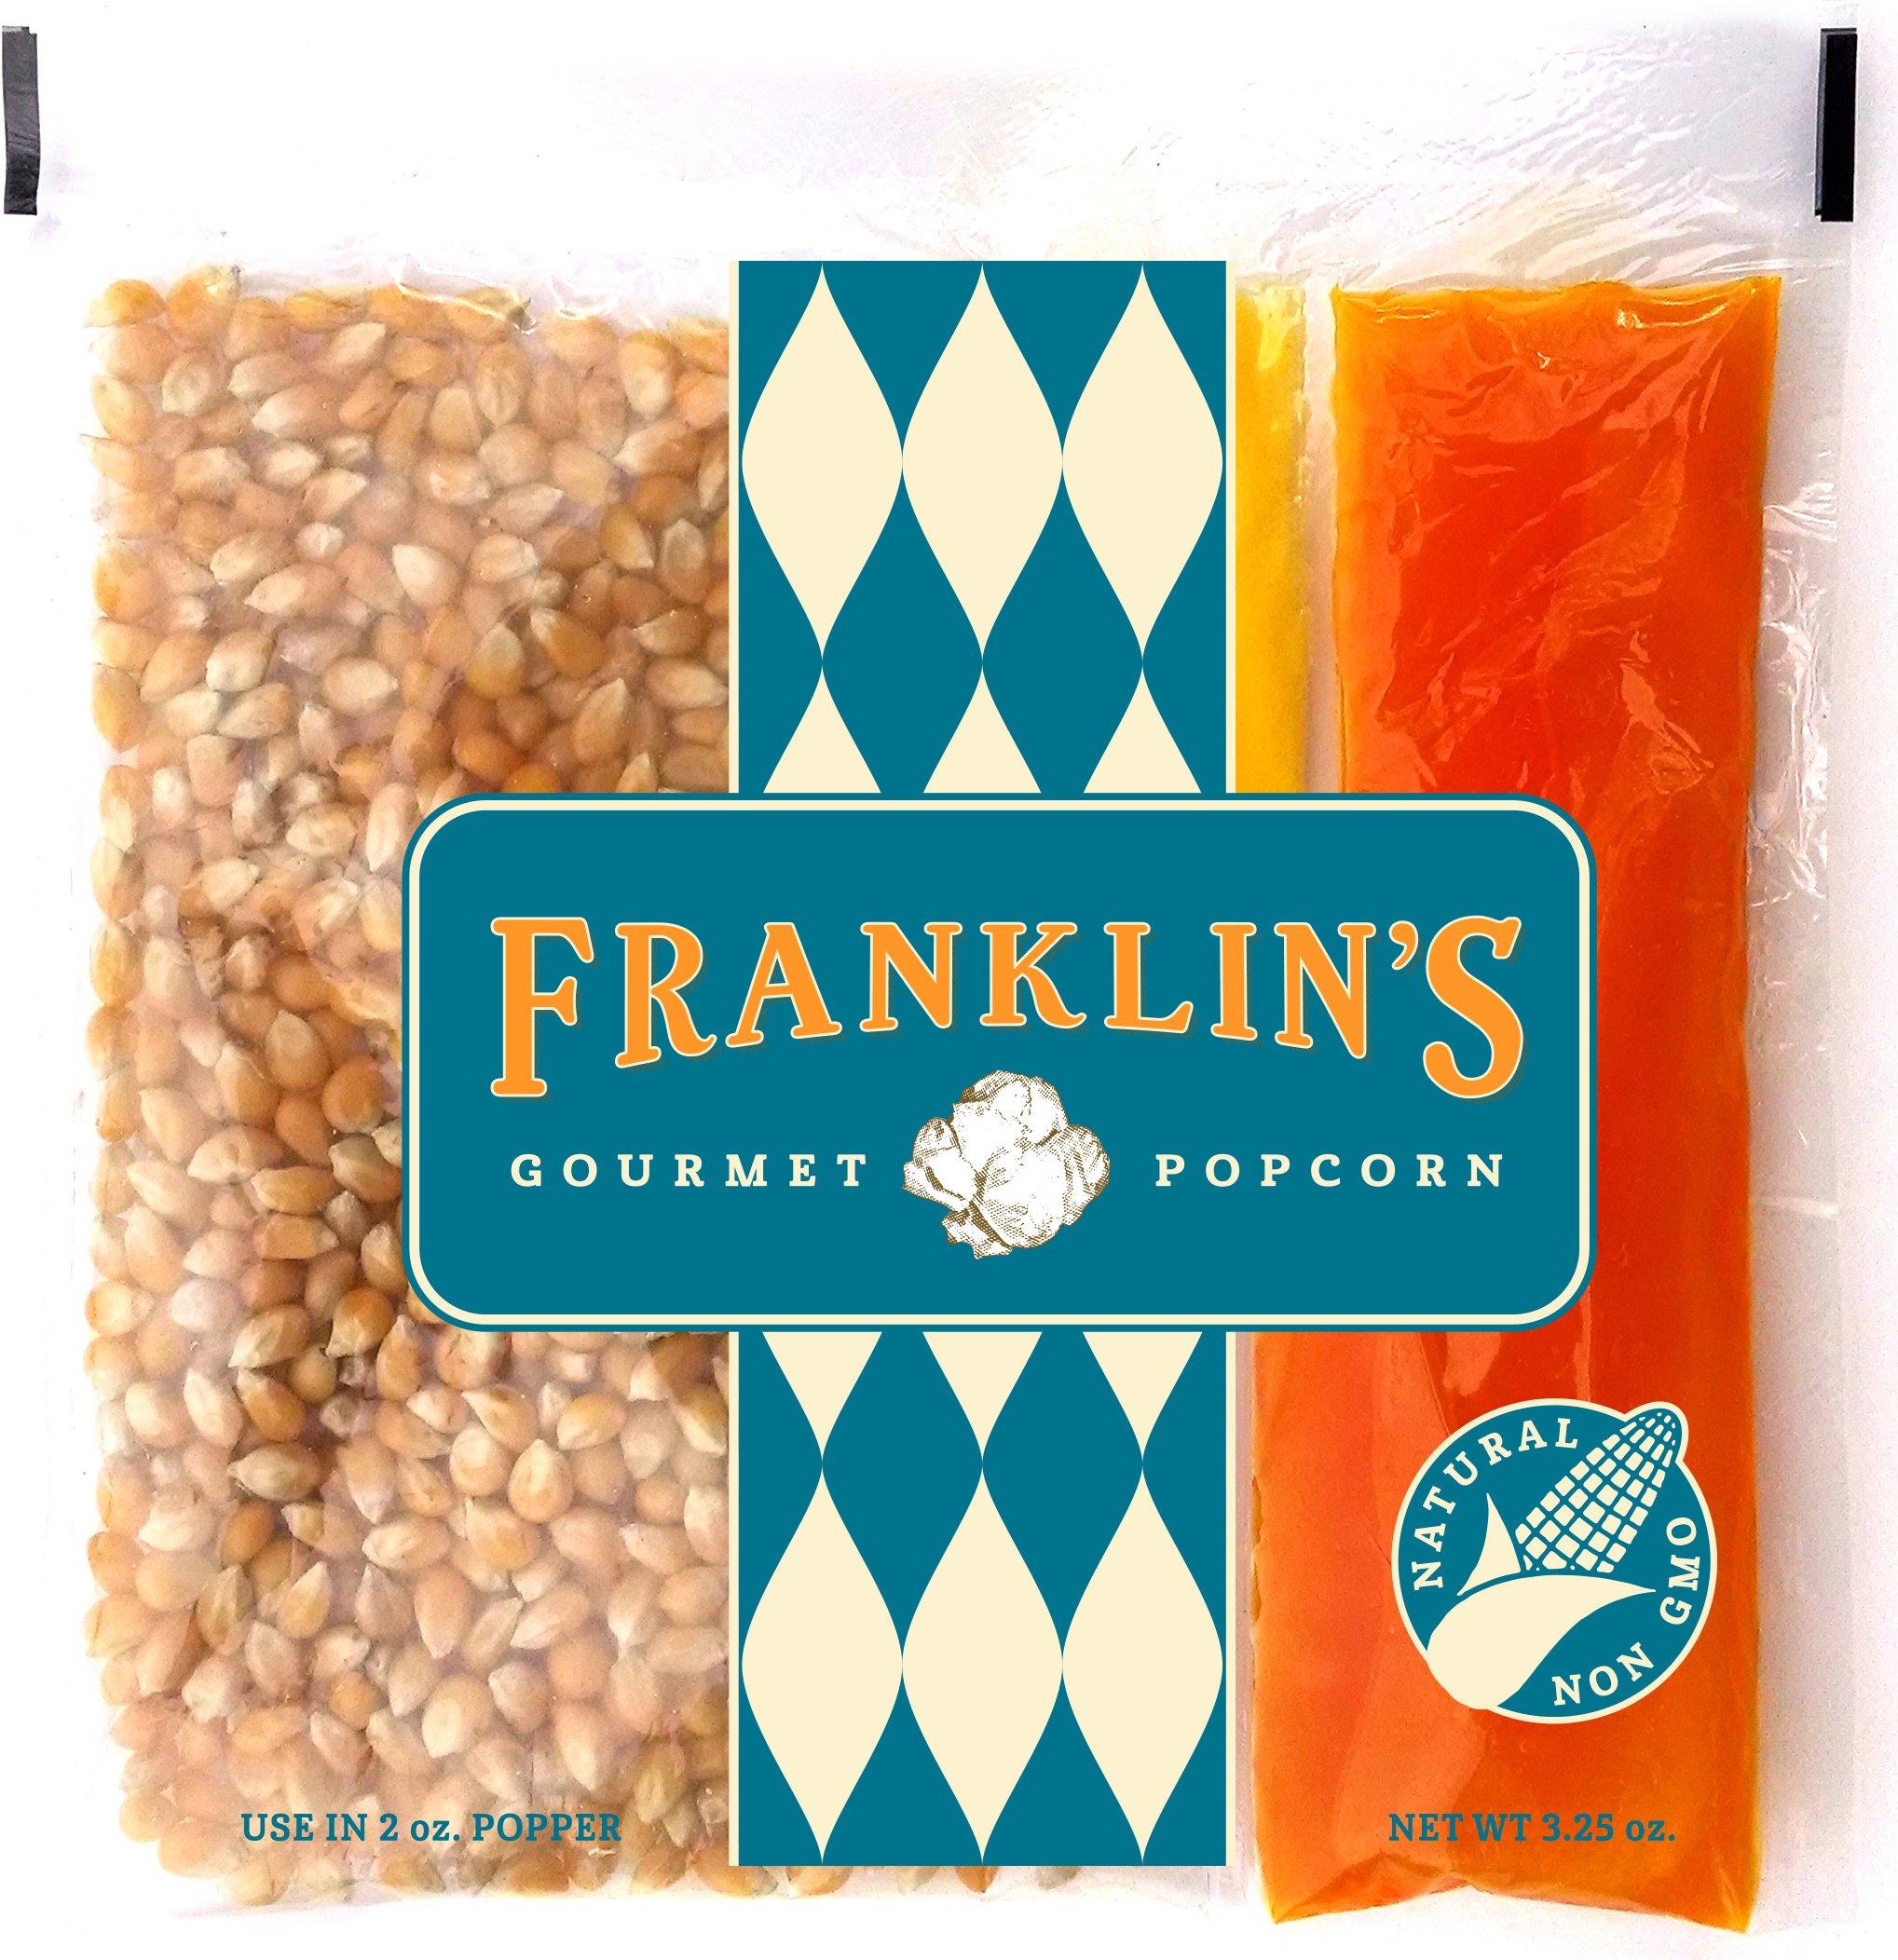 Franklin's Gourmet Popcorn All-In-One Pre-Measured Packs - 2oz. Pack of 24 - Butter Flavored Coconut Oil + Premium Butter Salt + Organic Corn, 100% Vegan - Best Movie Theater Taste – Made in USA